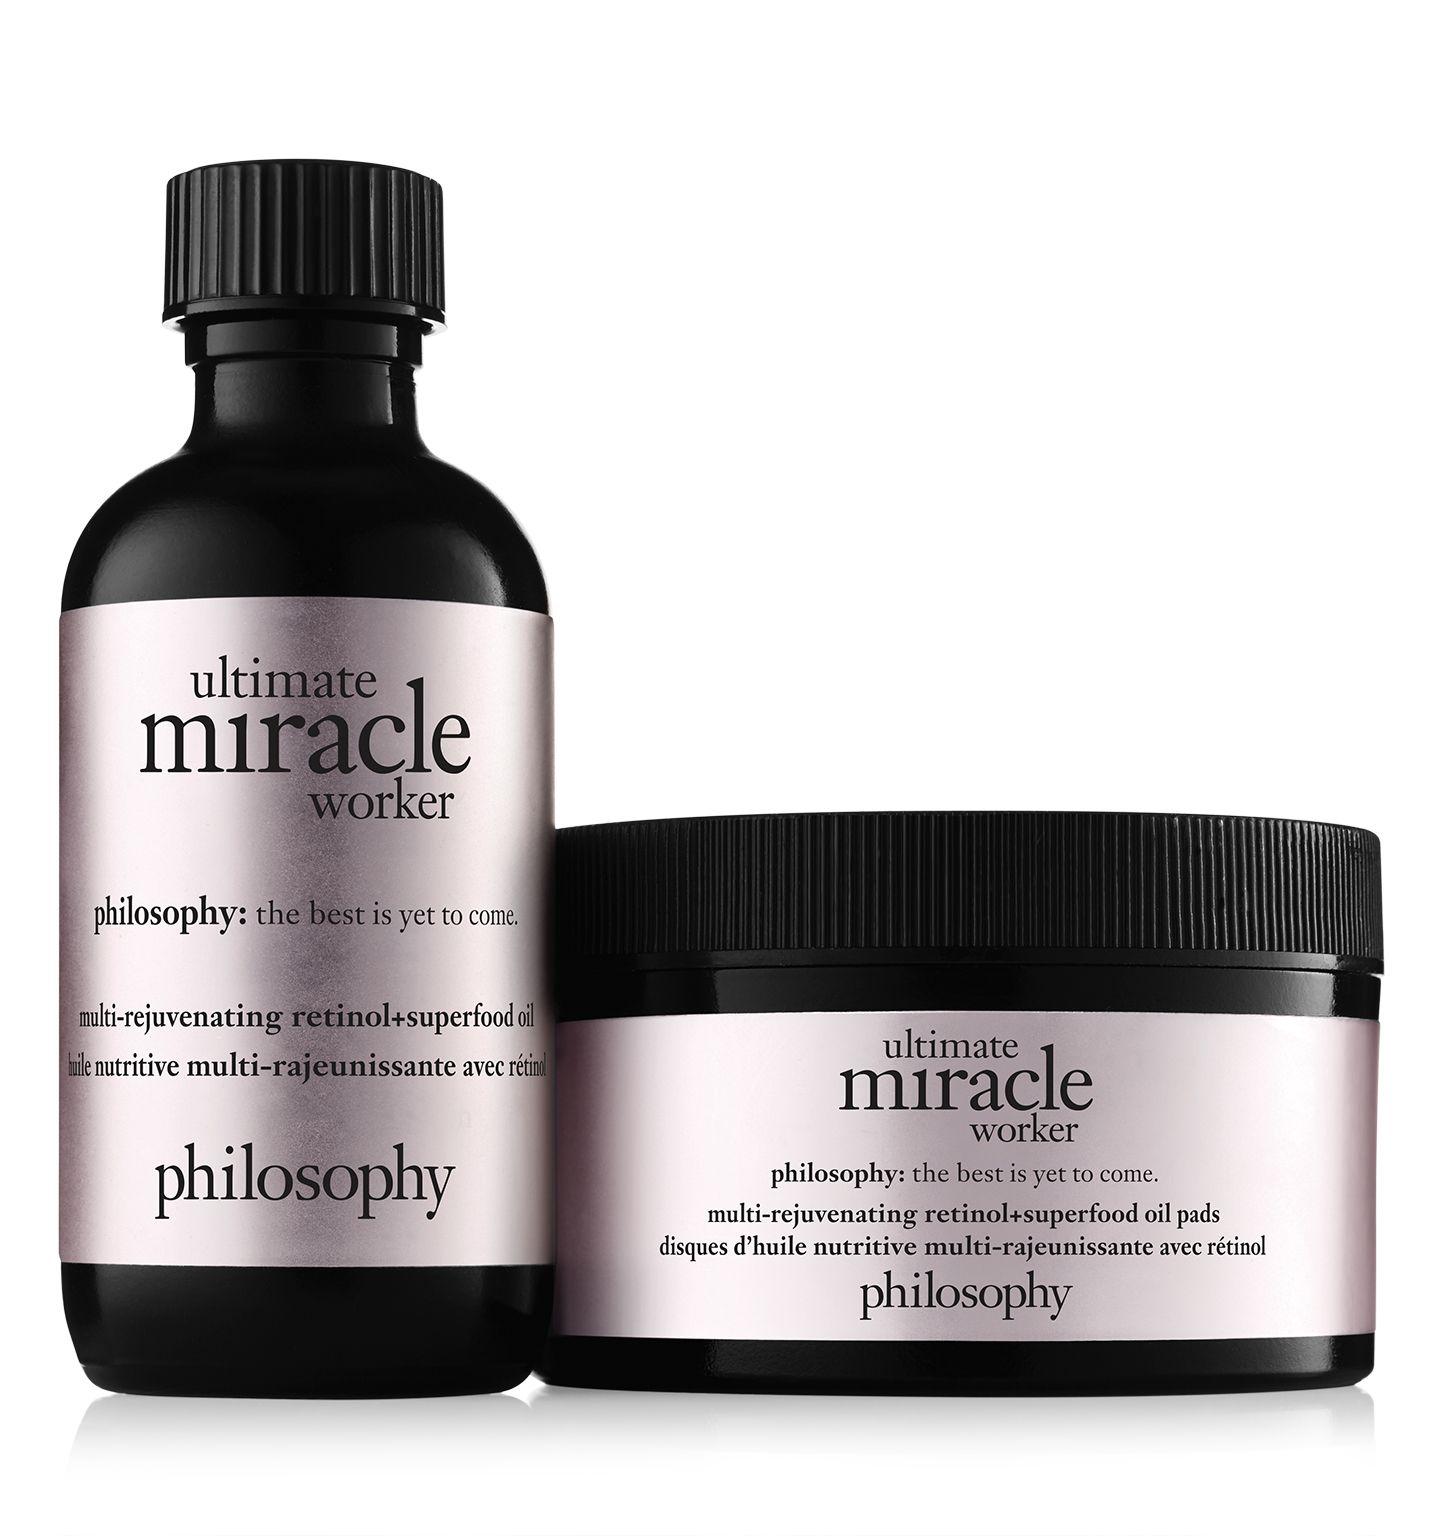 Philosophy Ultimate Miracle Worker Retinol Philosophy Skin Care Sensitive Skin Care